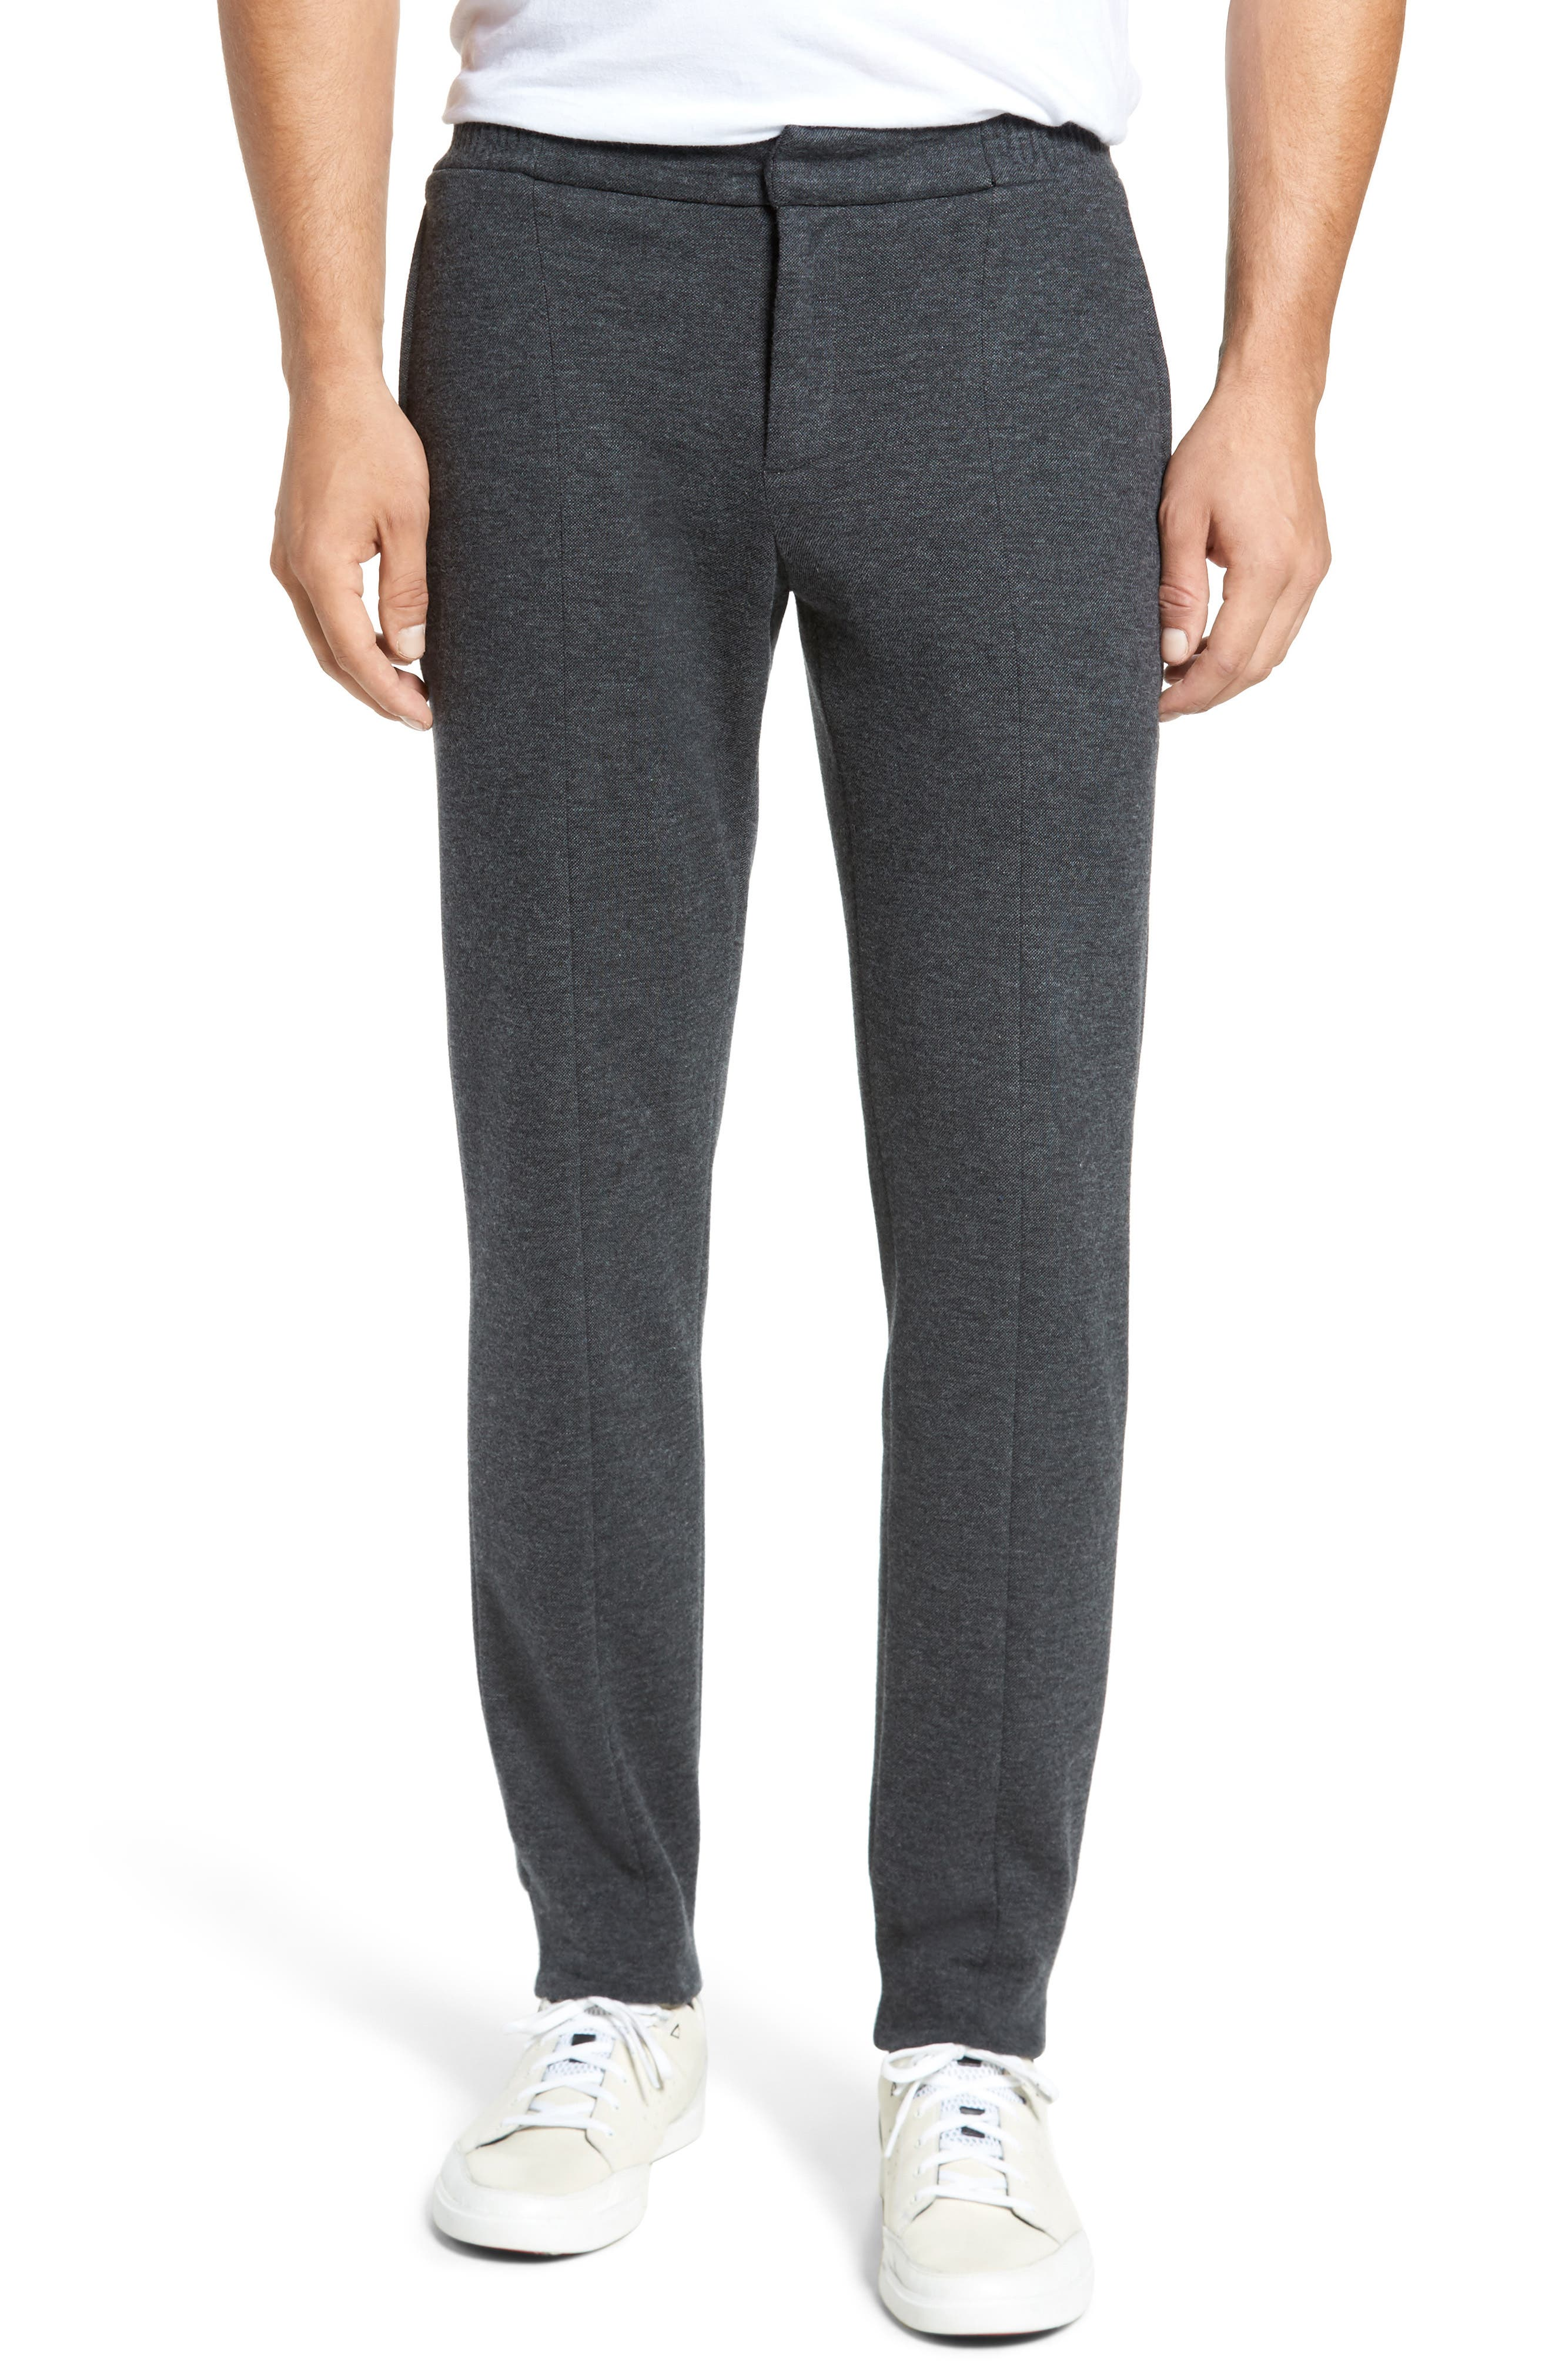 Main Image - Zanella Jordan Flat Front Cotton Jogger Trousers